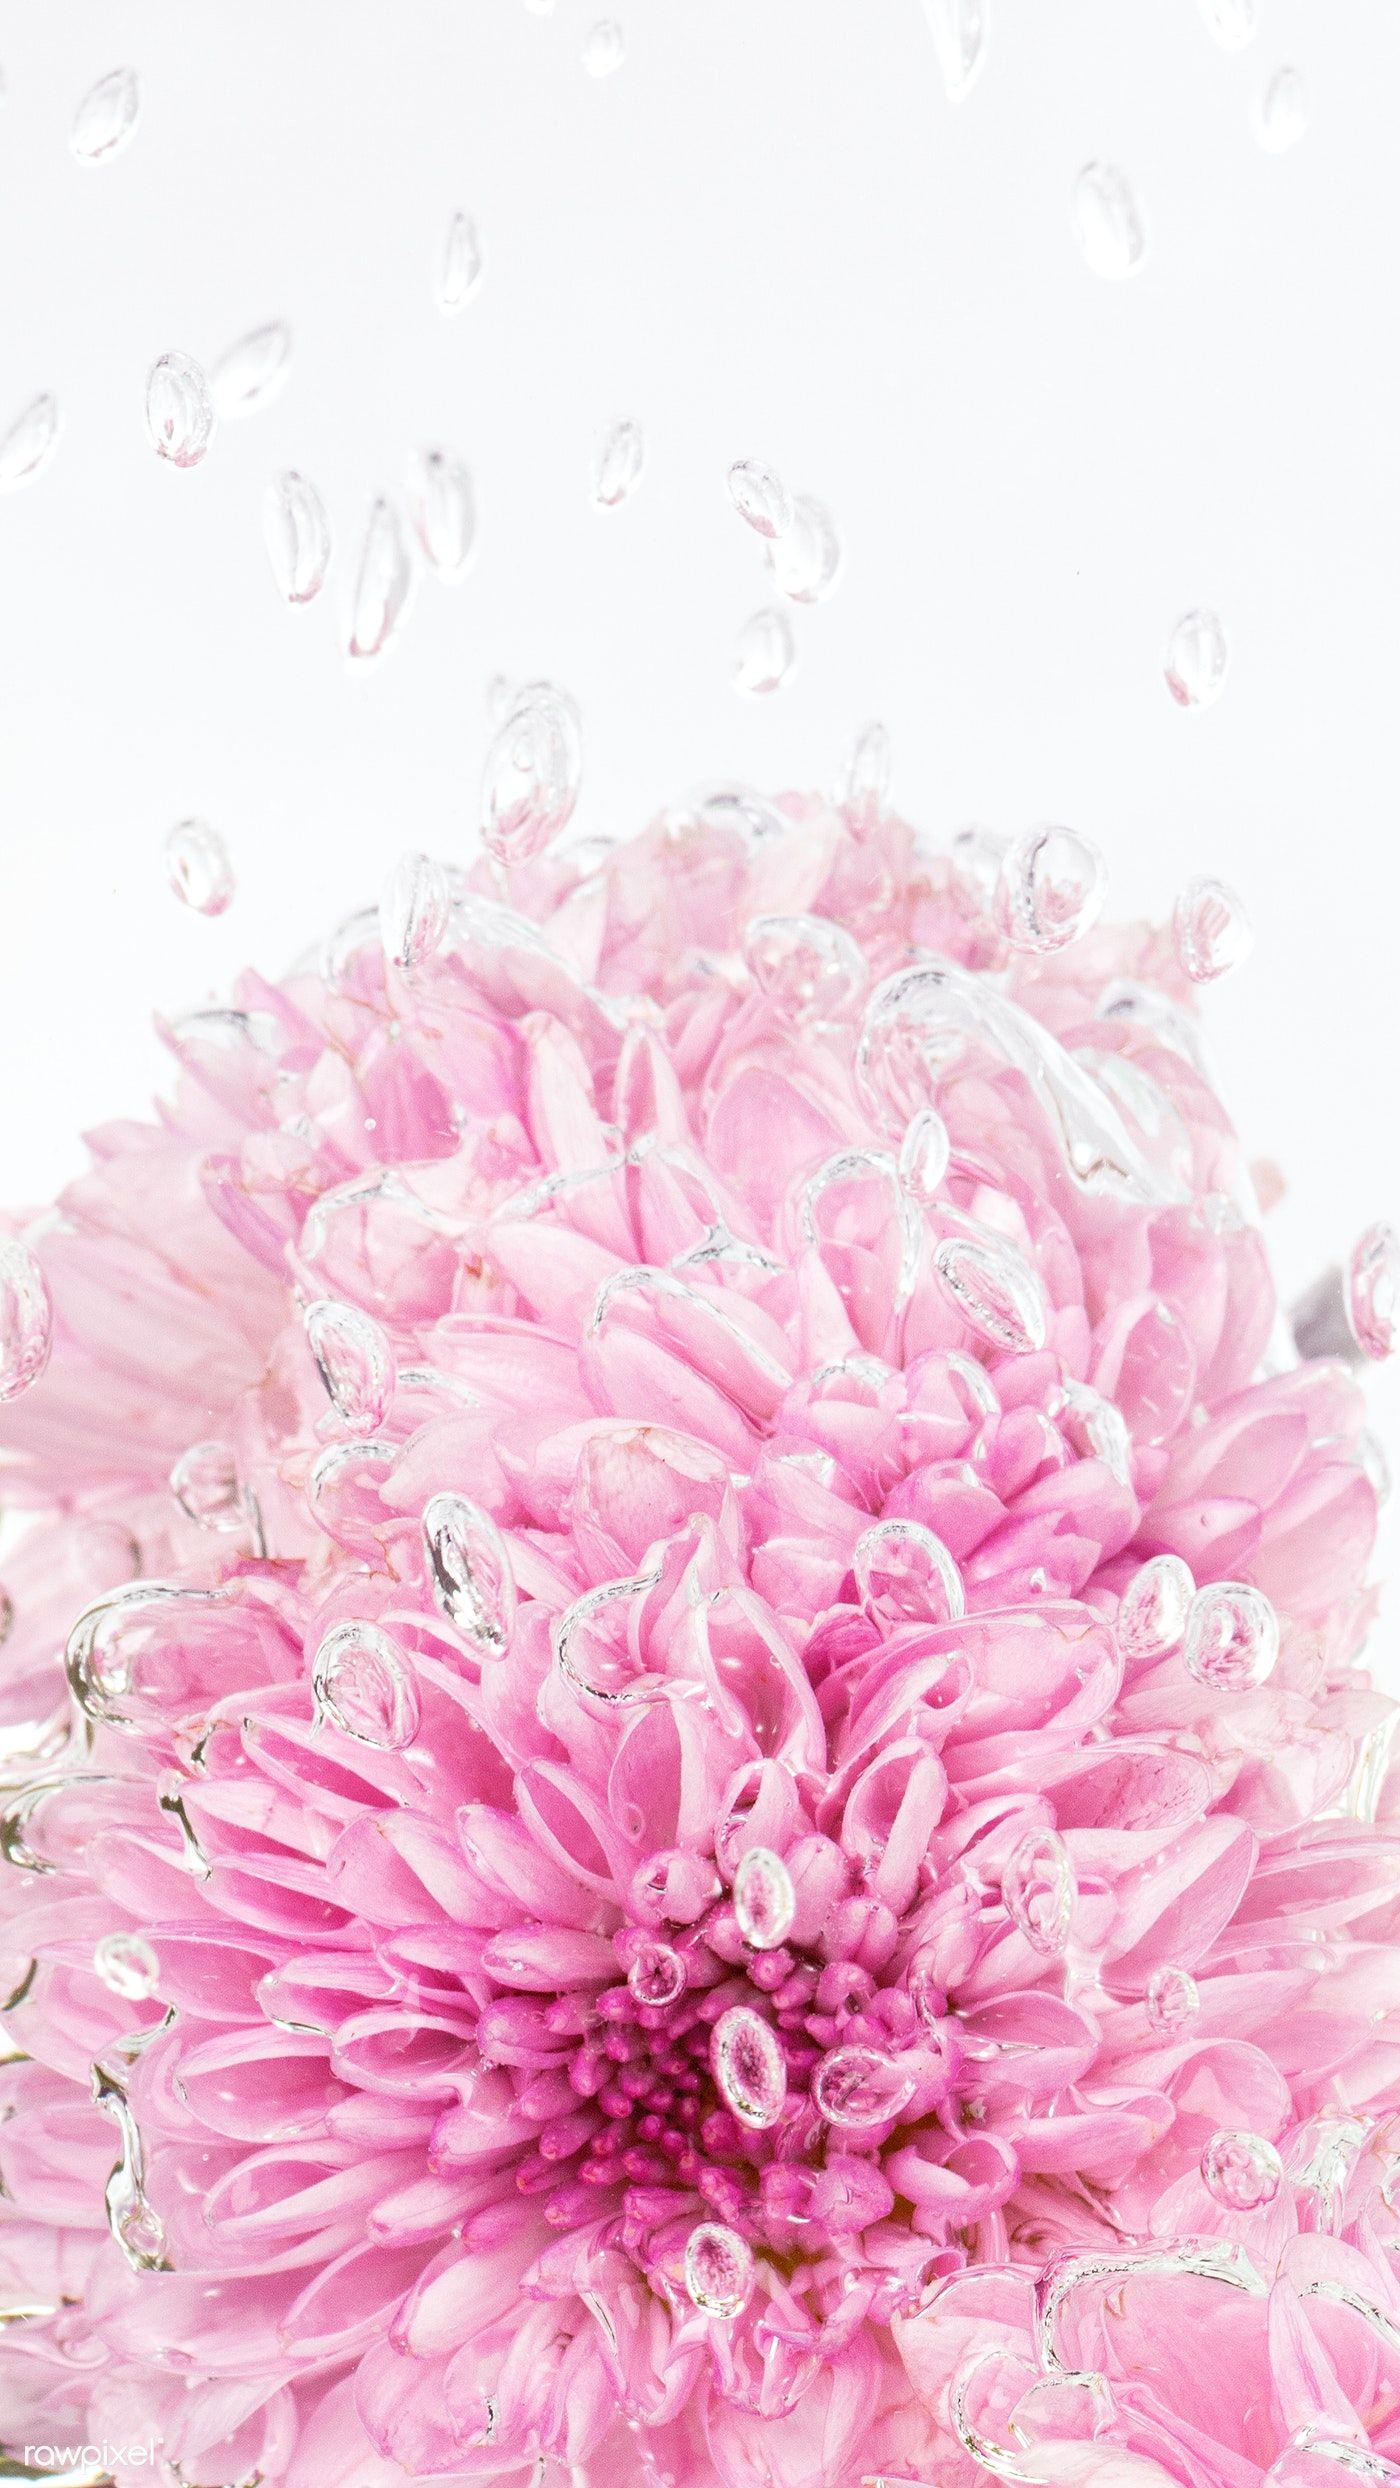 Download Premium Image Of Pink Chrysanthemum Flower In Water With Air Flower Aesthetic Chrysanthemum Flower Flowers Photography Coolest chrysanthemum flower wallpaper